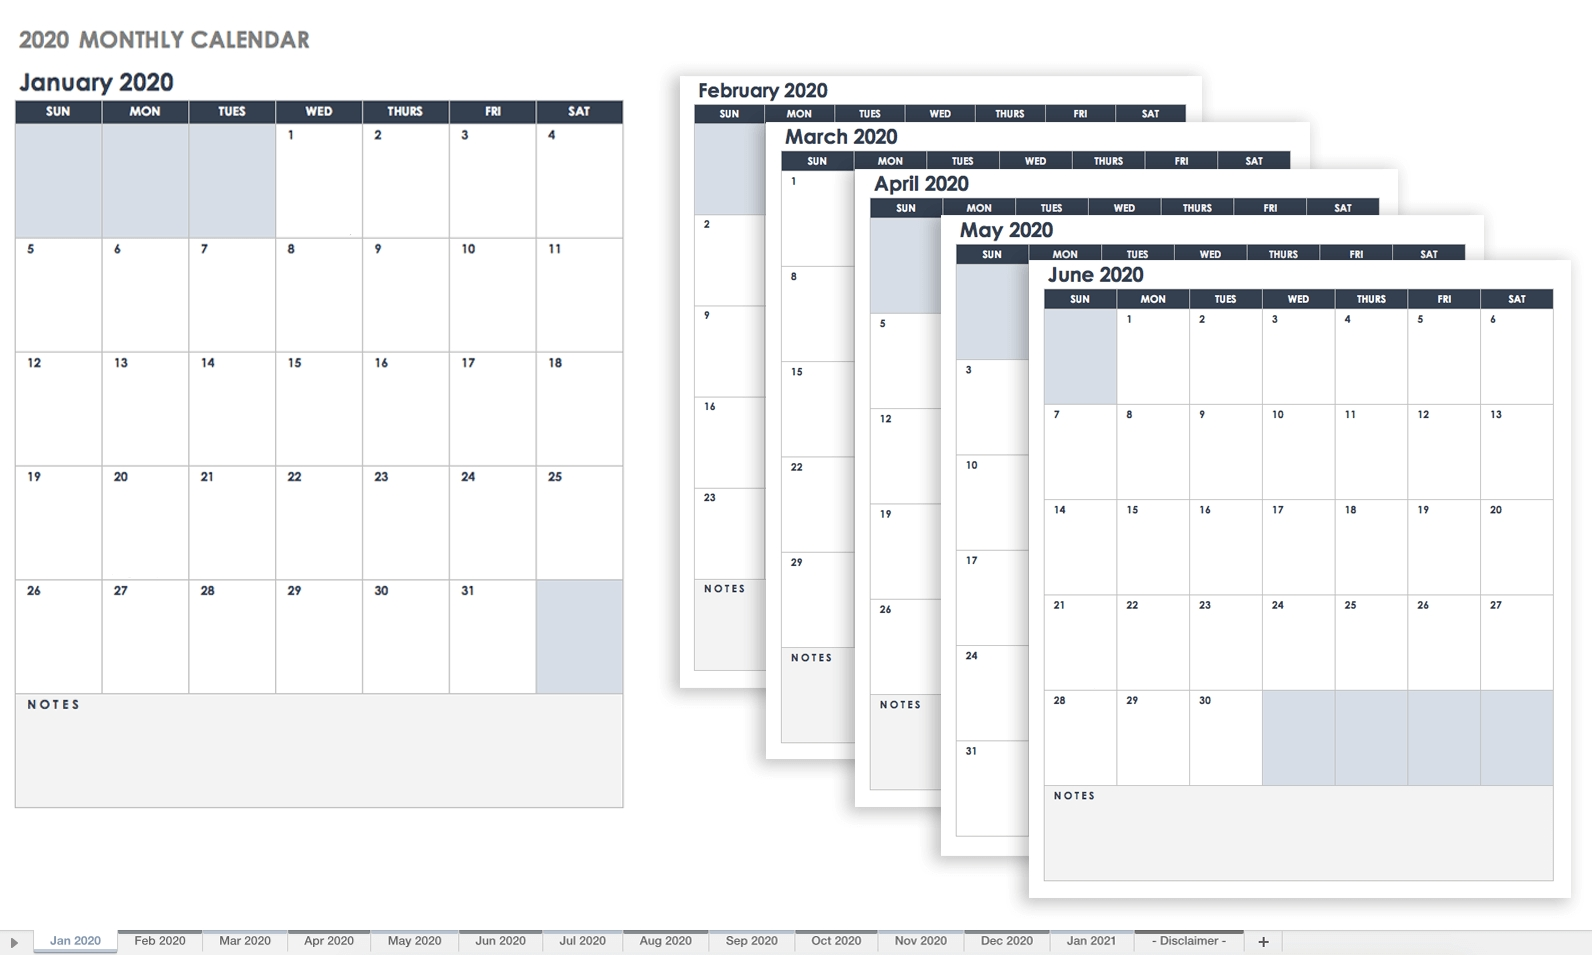 Free Google Calendar Templates | Smartsheet  2020 Attendane Tracking Calendar